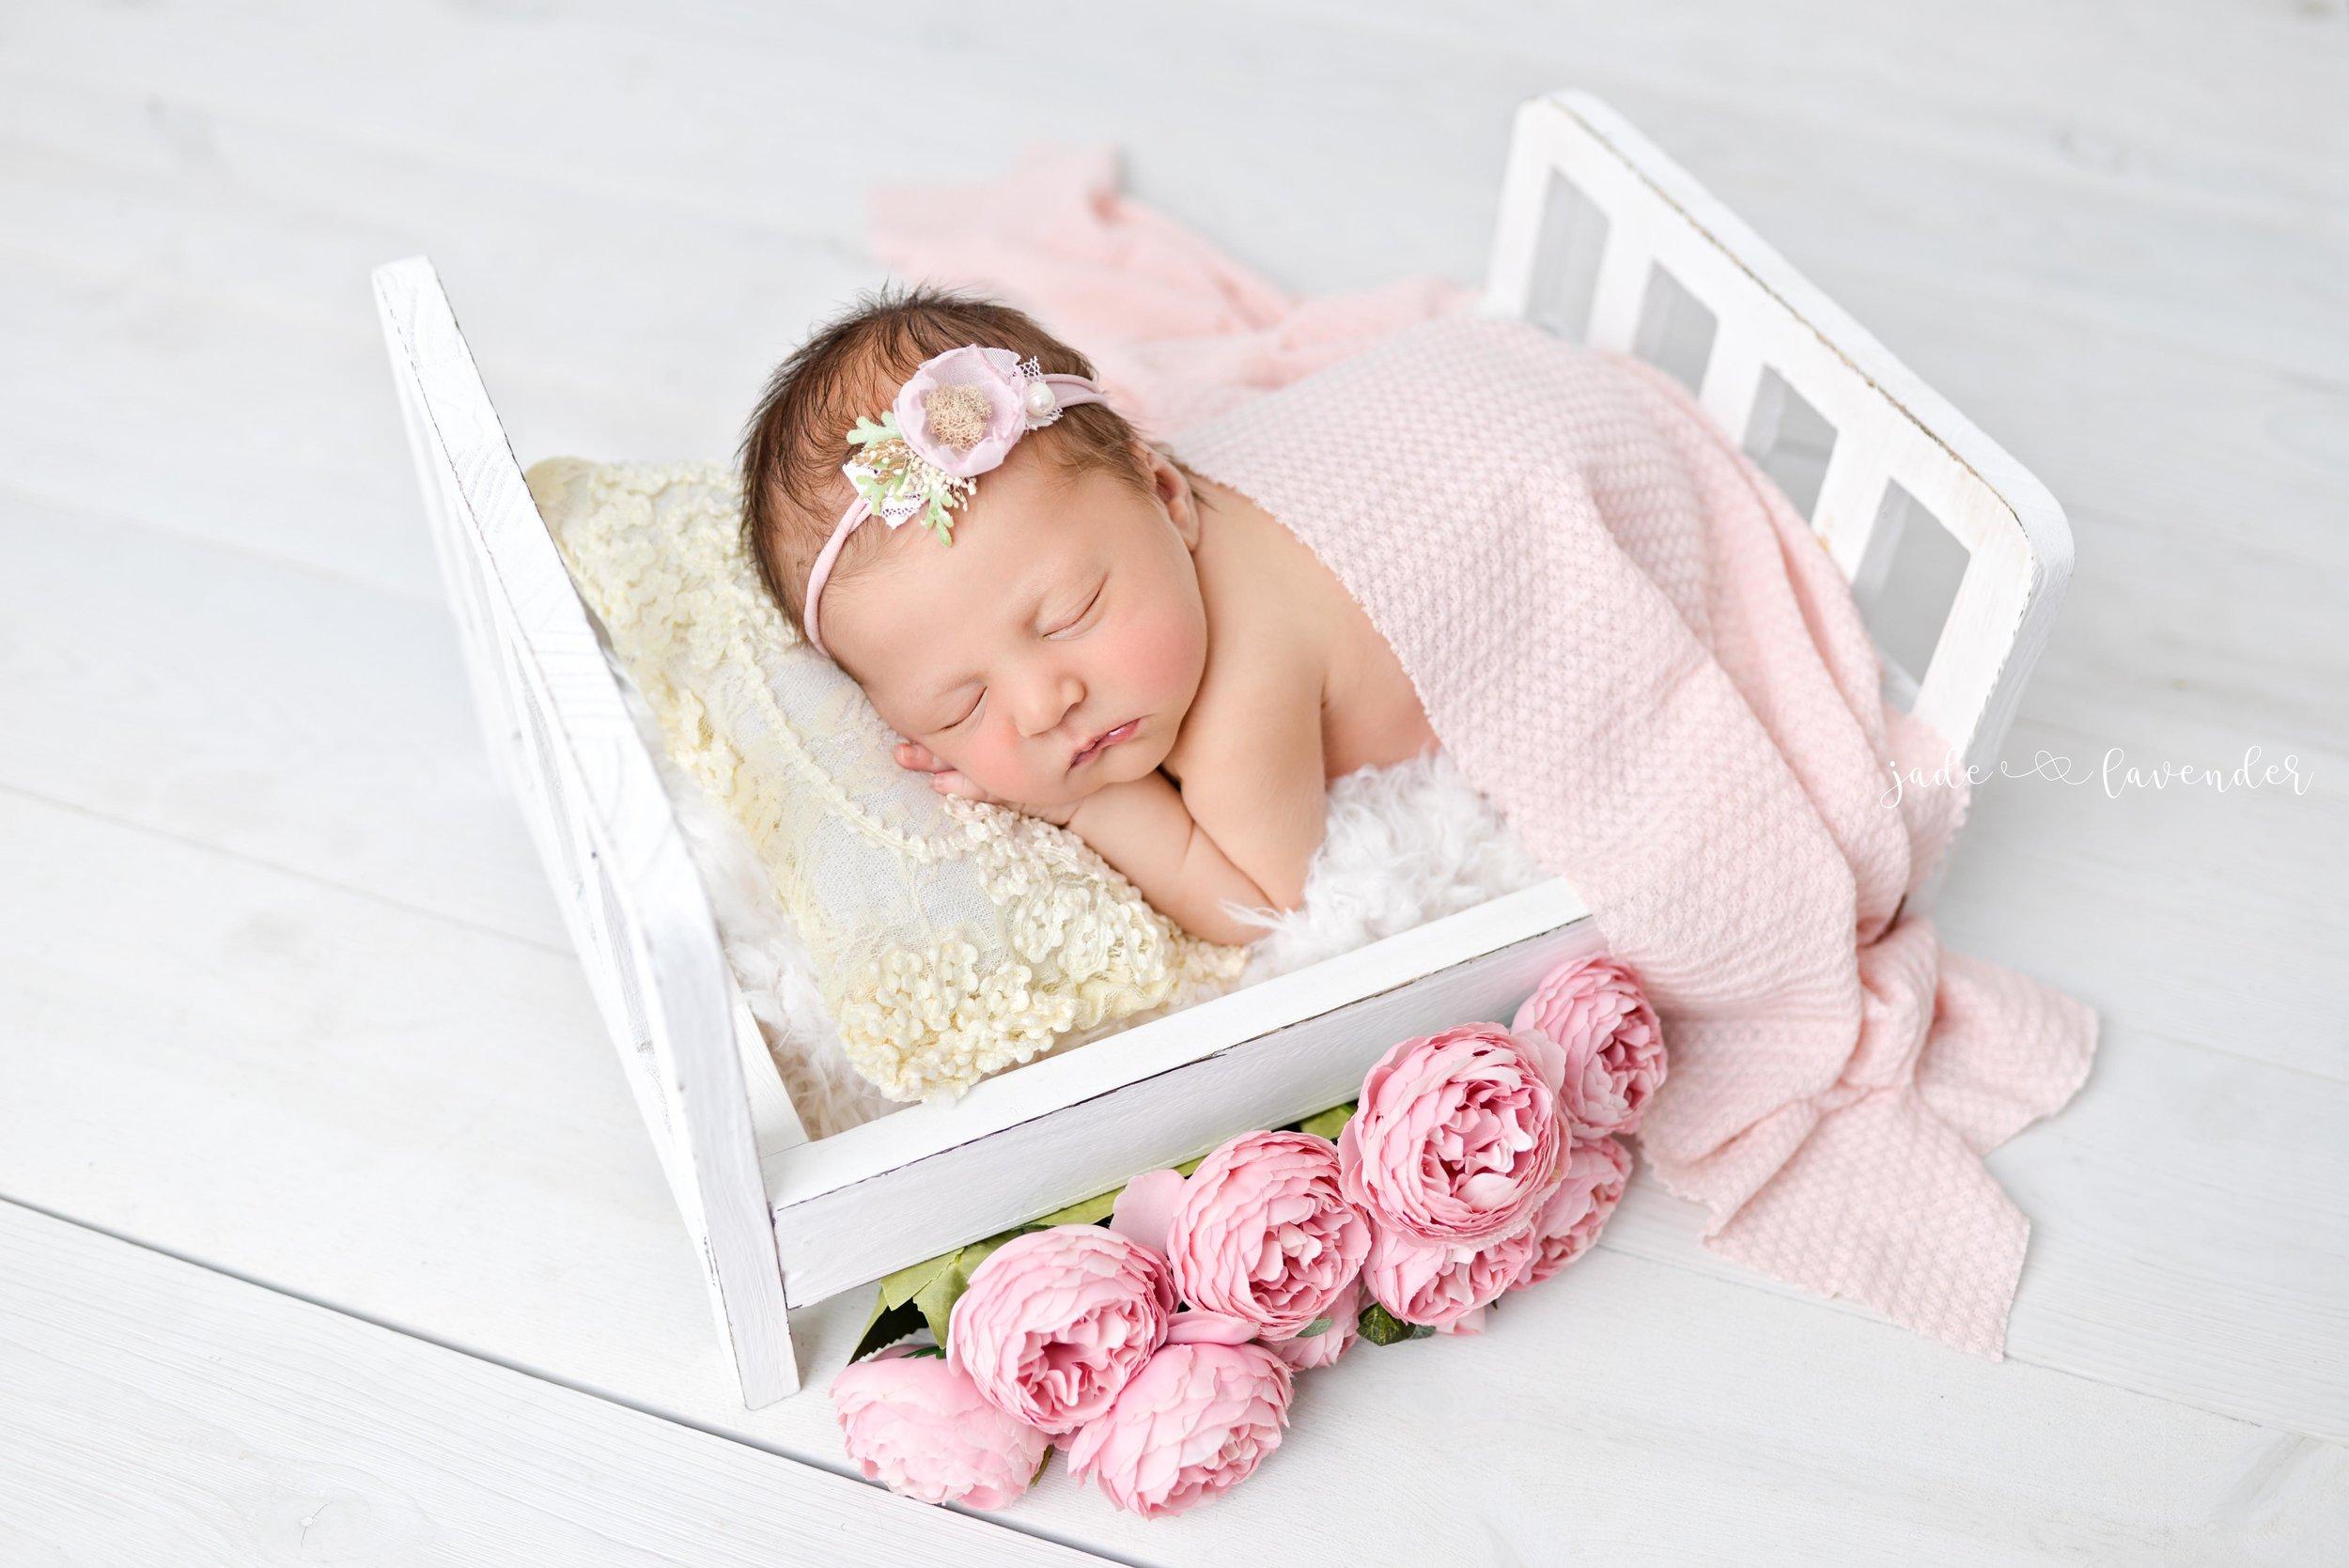 Baby-girl-pink-newborn-photography-infant-images-baby-photos-photographer-spokane-washington (7 of 8).jpg